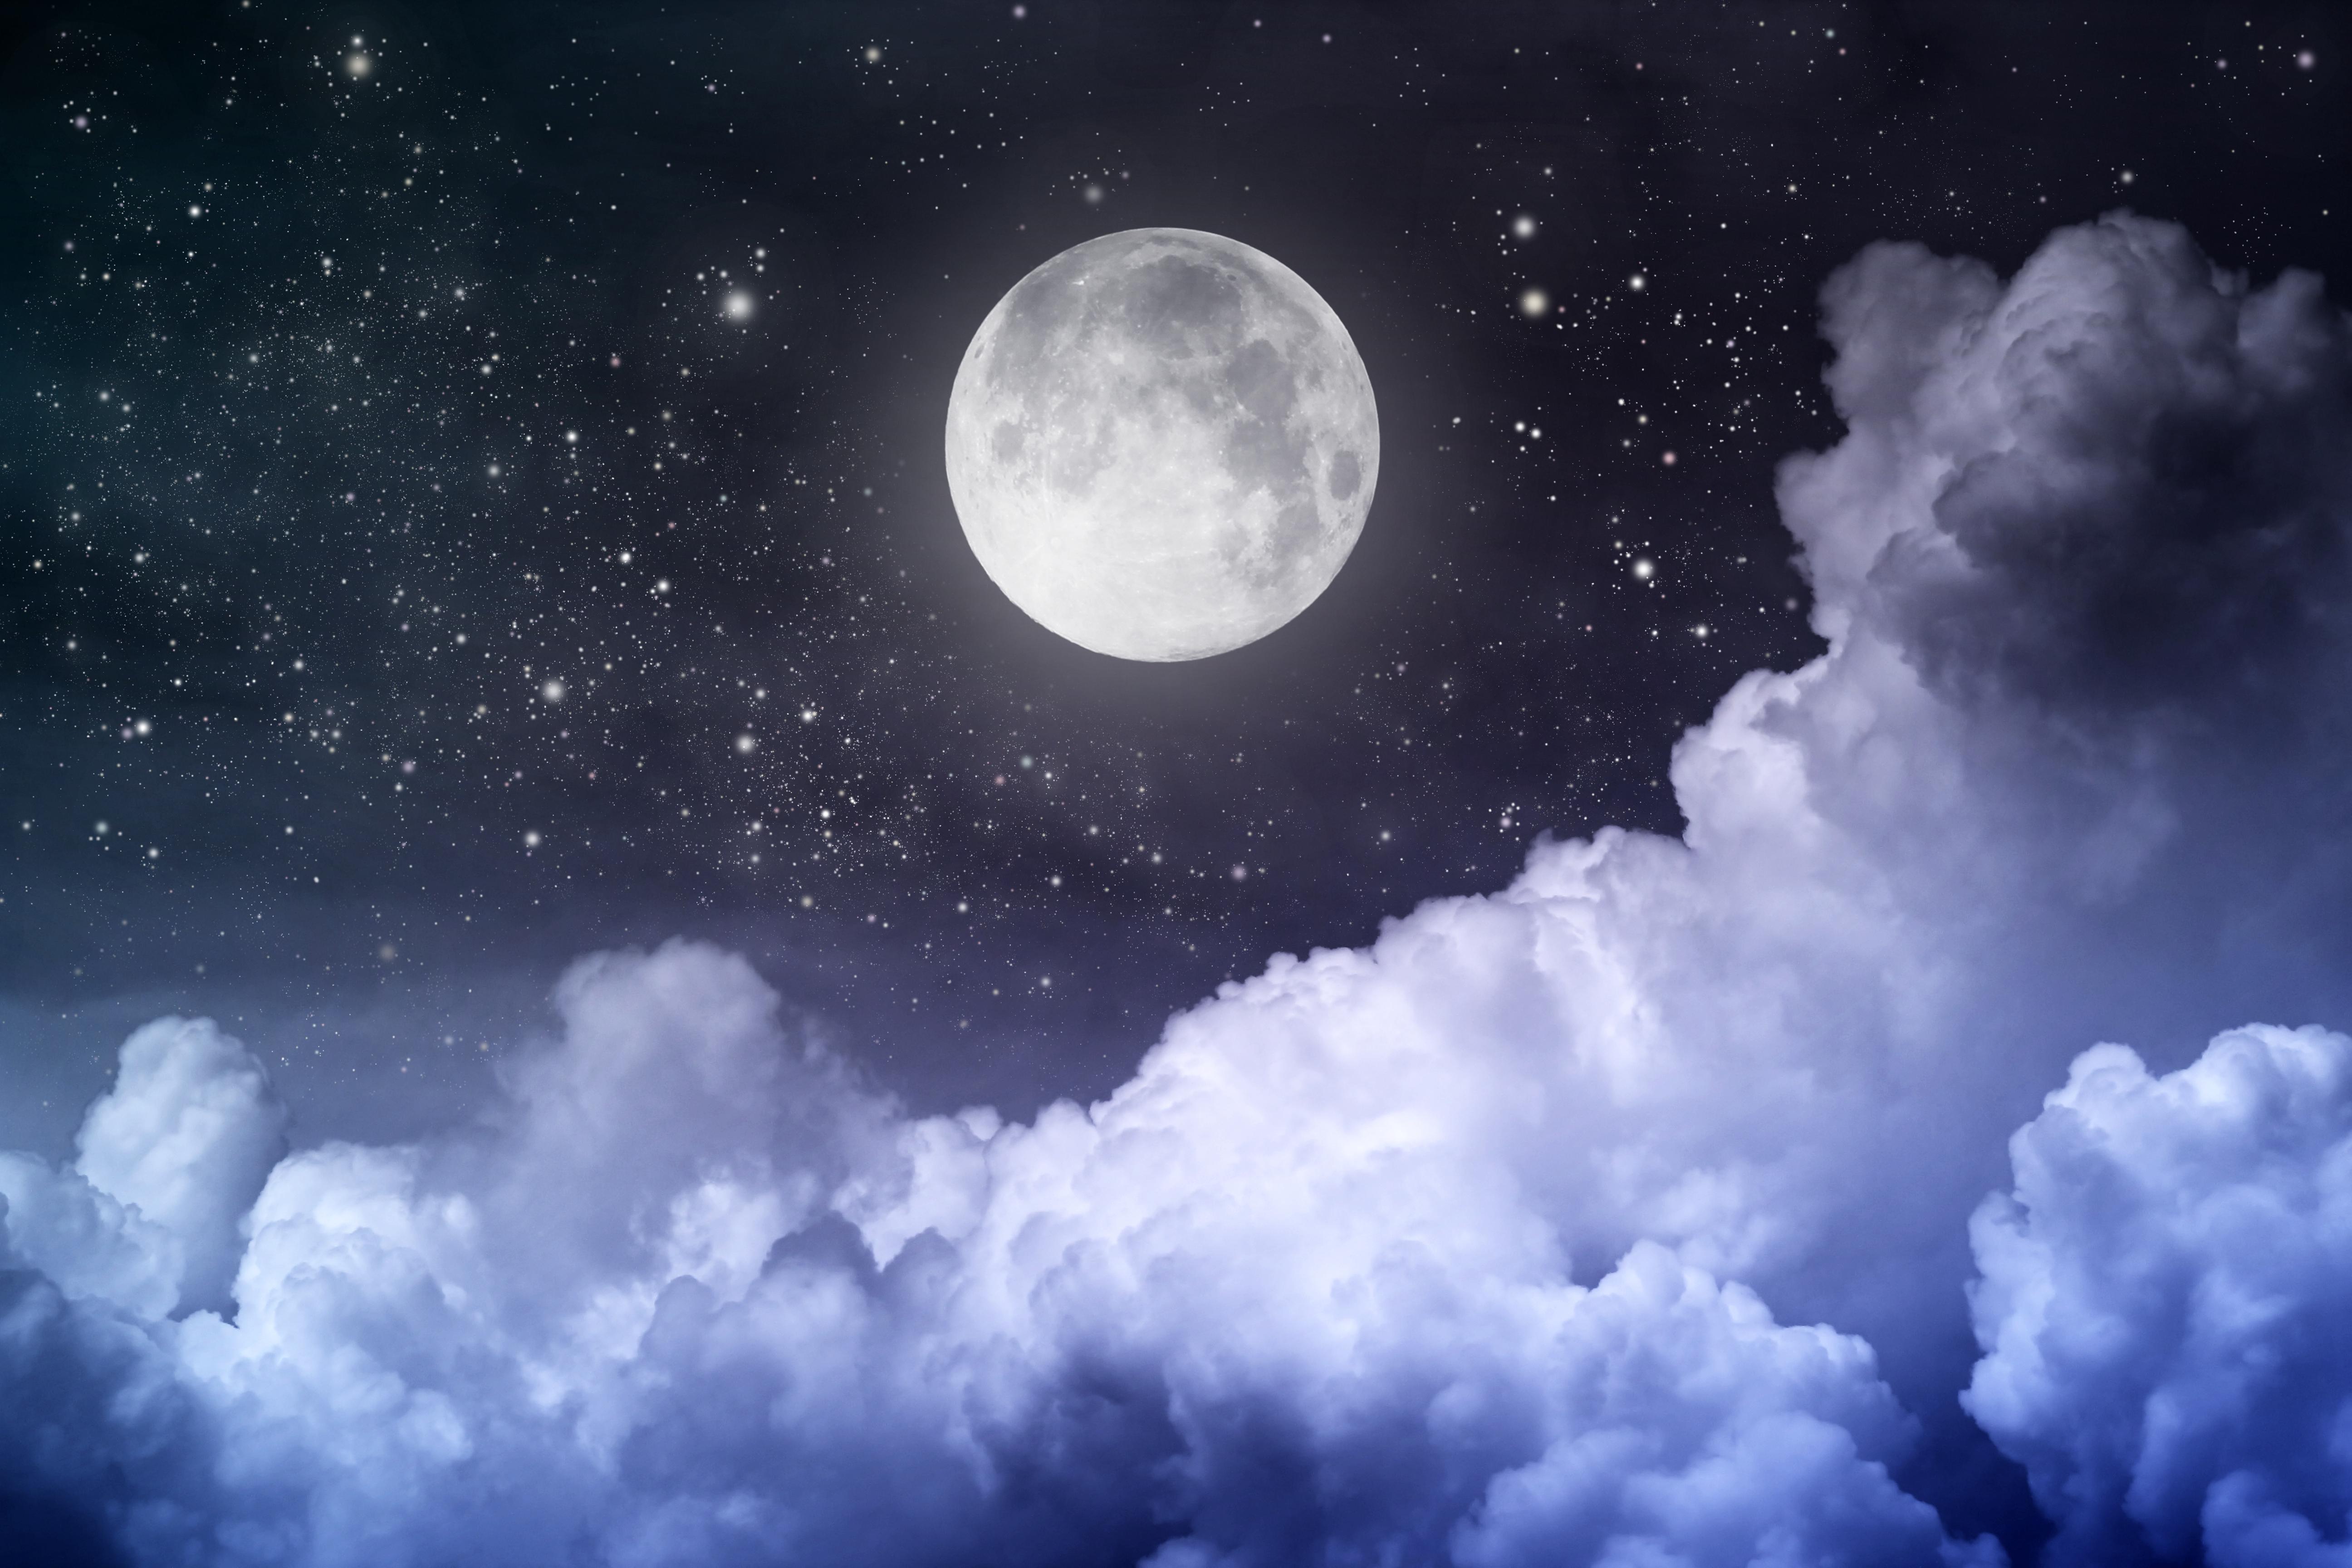 Moonlight clipart full moon Full Sky Moon Clouds Full